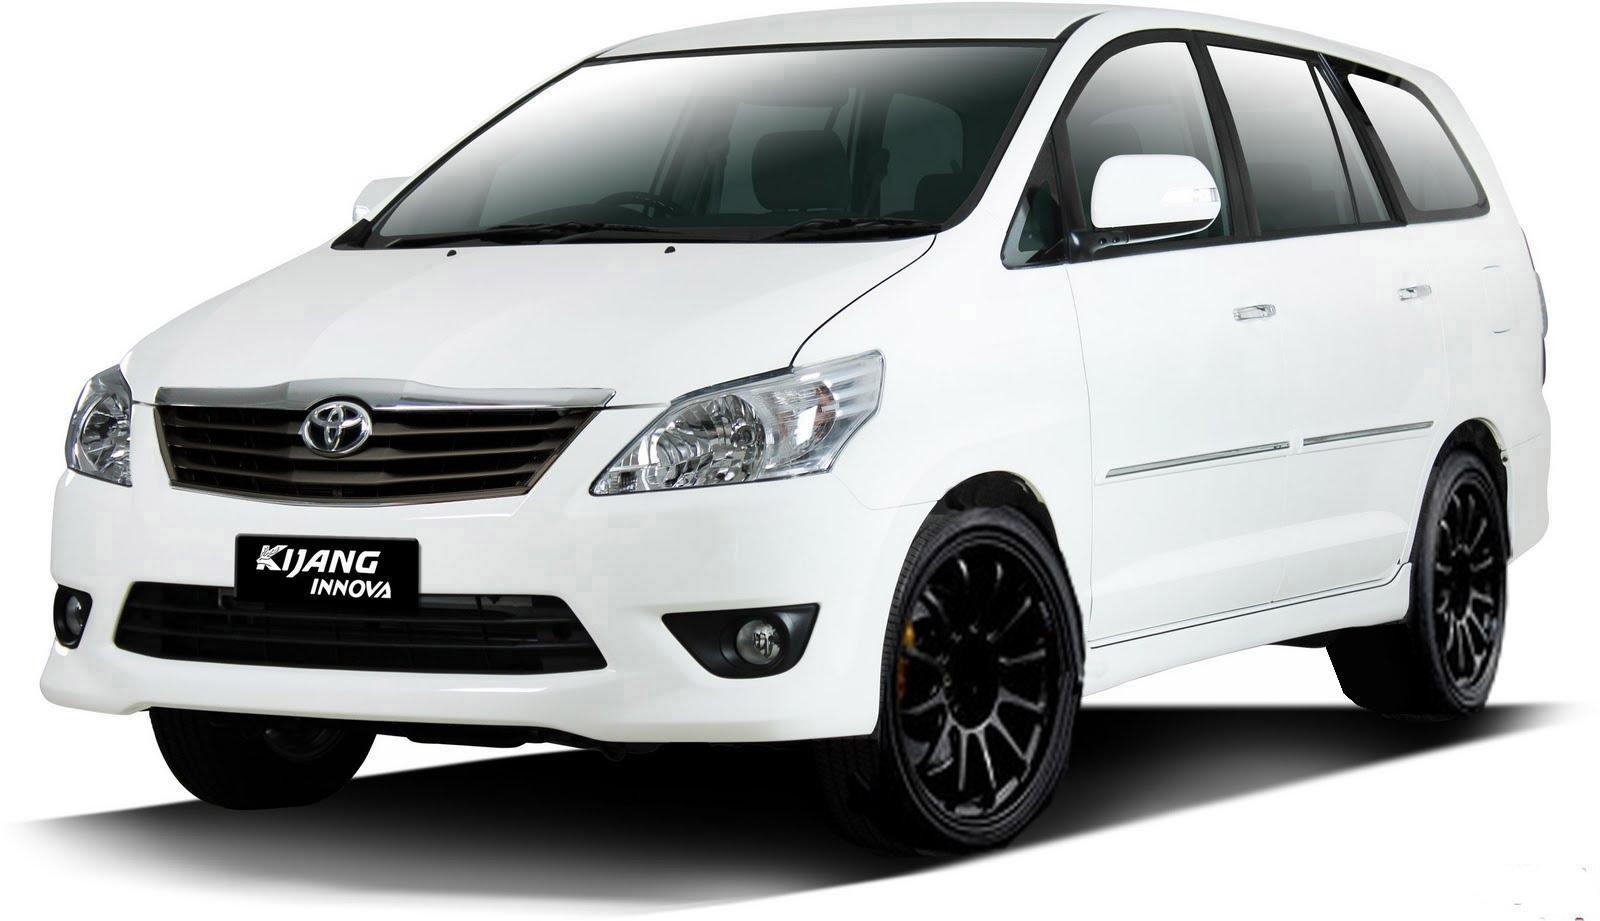 Ukuran Wiper Grand New Avanza Toyota Yaris Trd Sportivo Vs Honda Jazz Rs Harga Jual Velg Kaleng Baru Ban R14